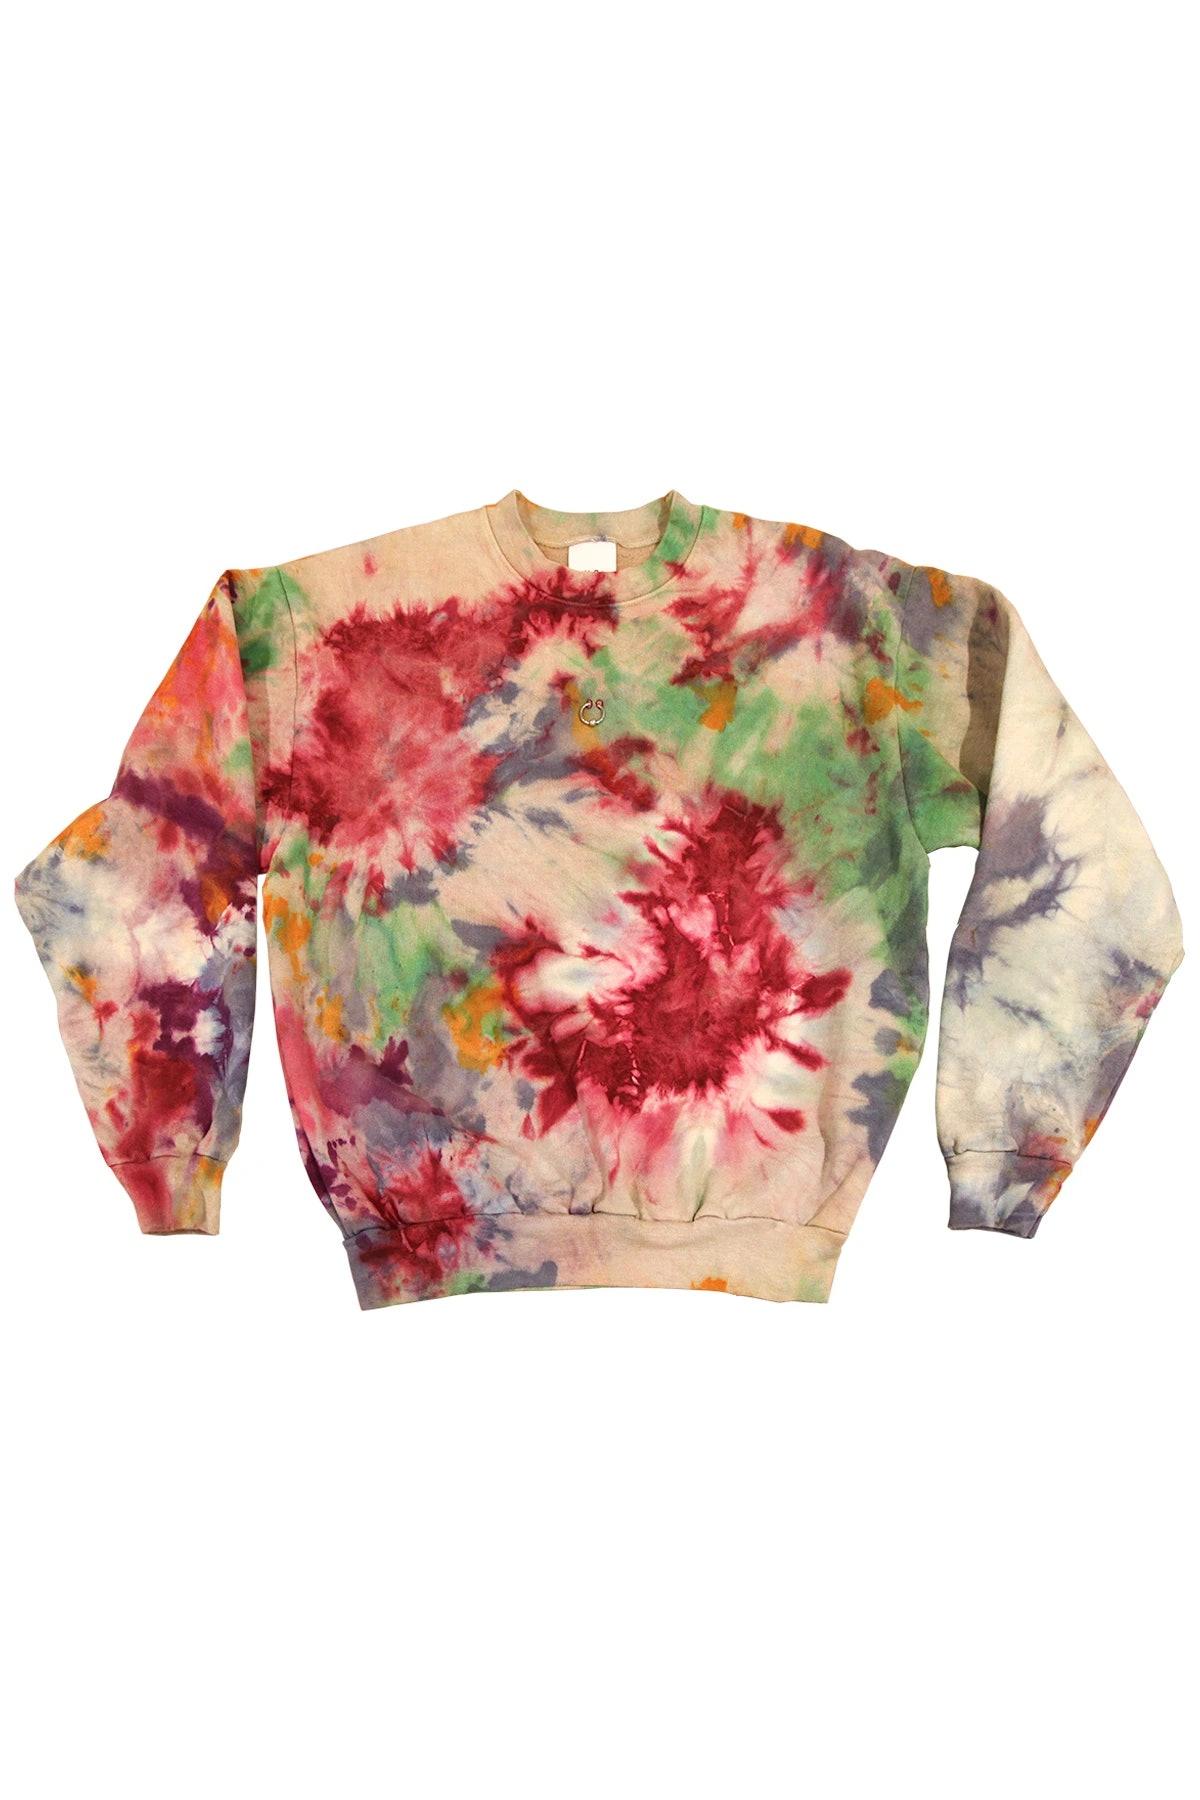 Pierced Crewneck Sweatshirt in 7420c Tie-Dye